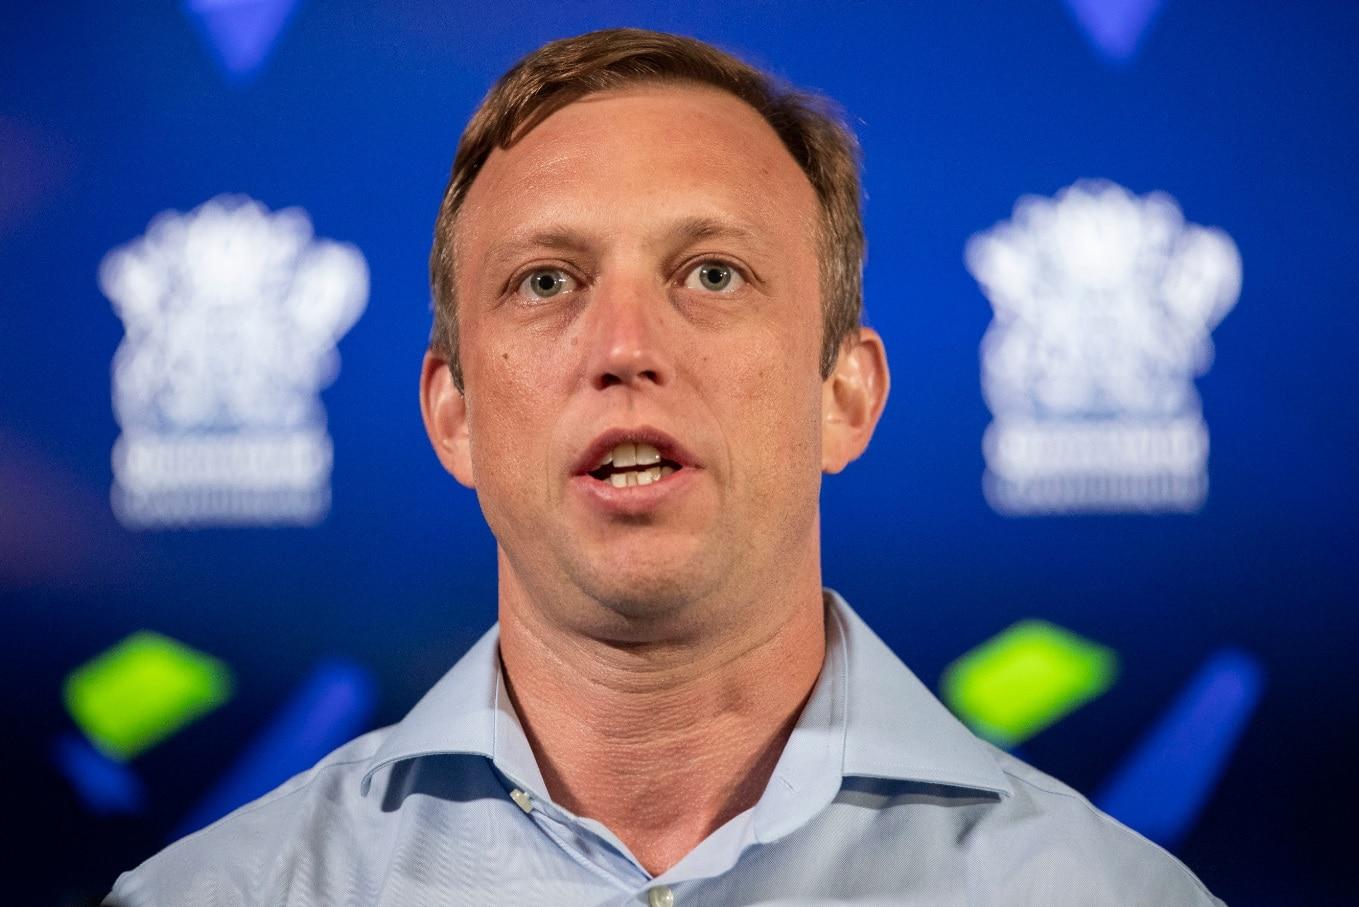 Queensland Health Minister Steven Miles